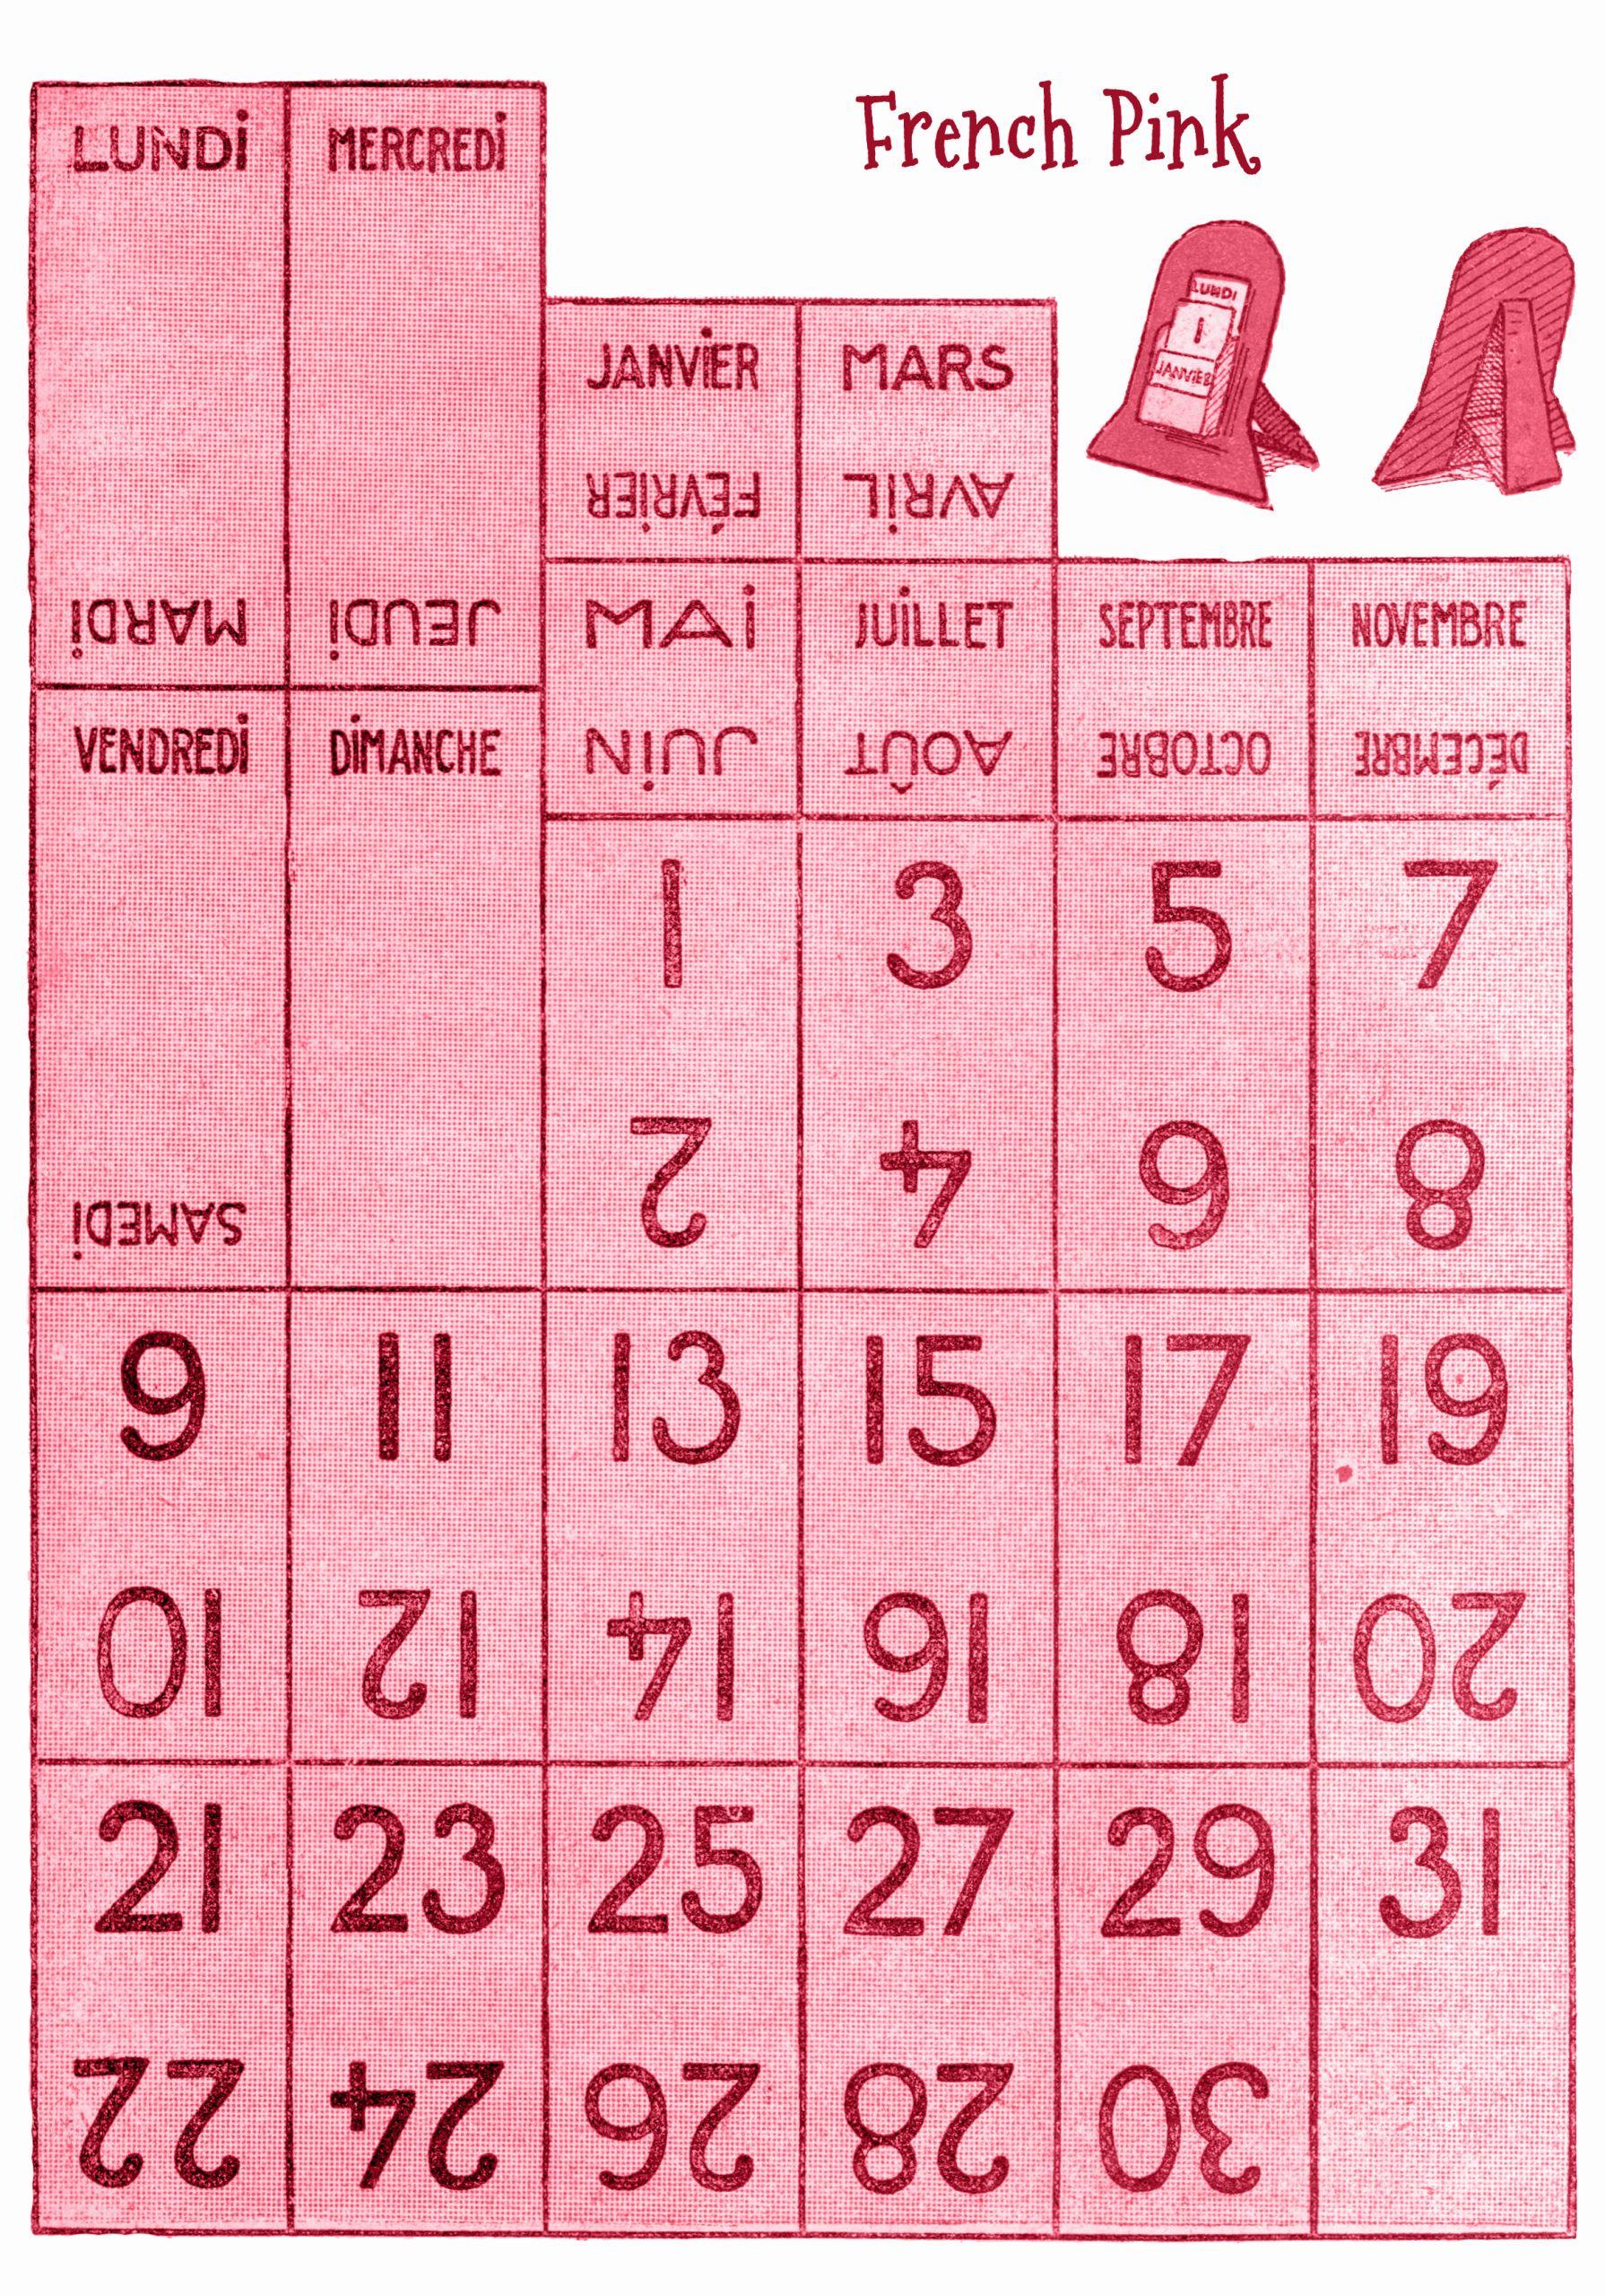 Printable Perpetual Calendar Chart Unique Vintage Perpetual Calendar – Free Printable – Wings Of Whimsy